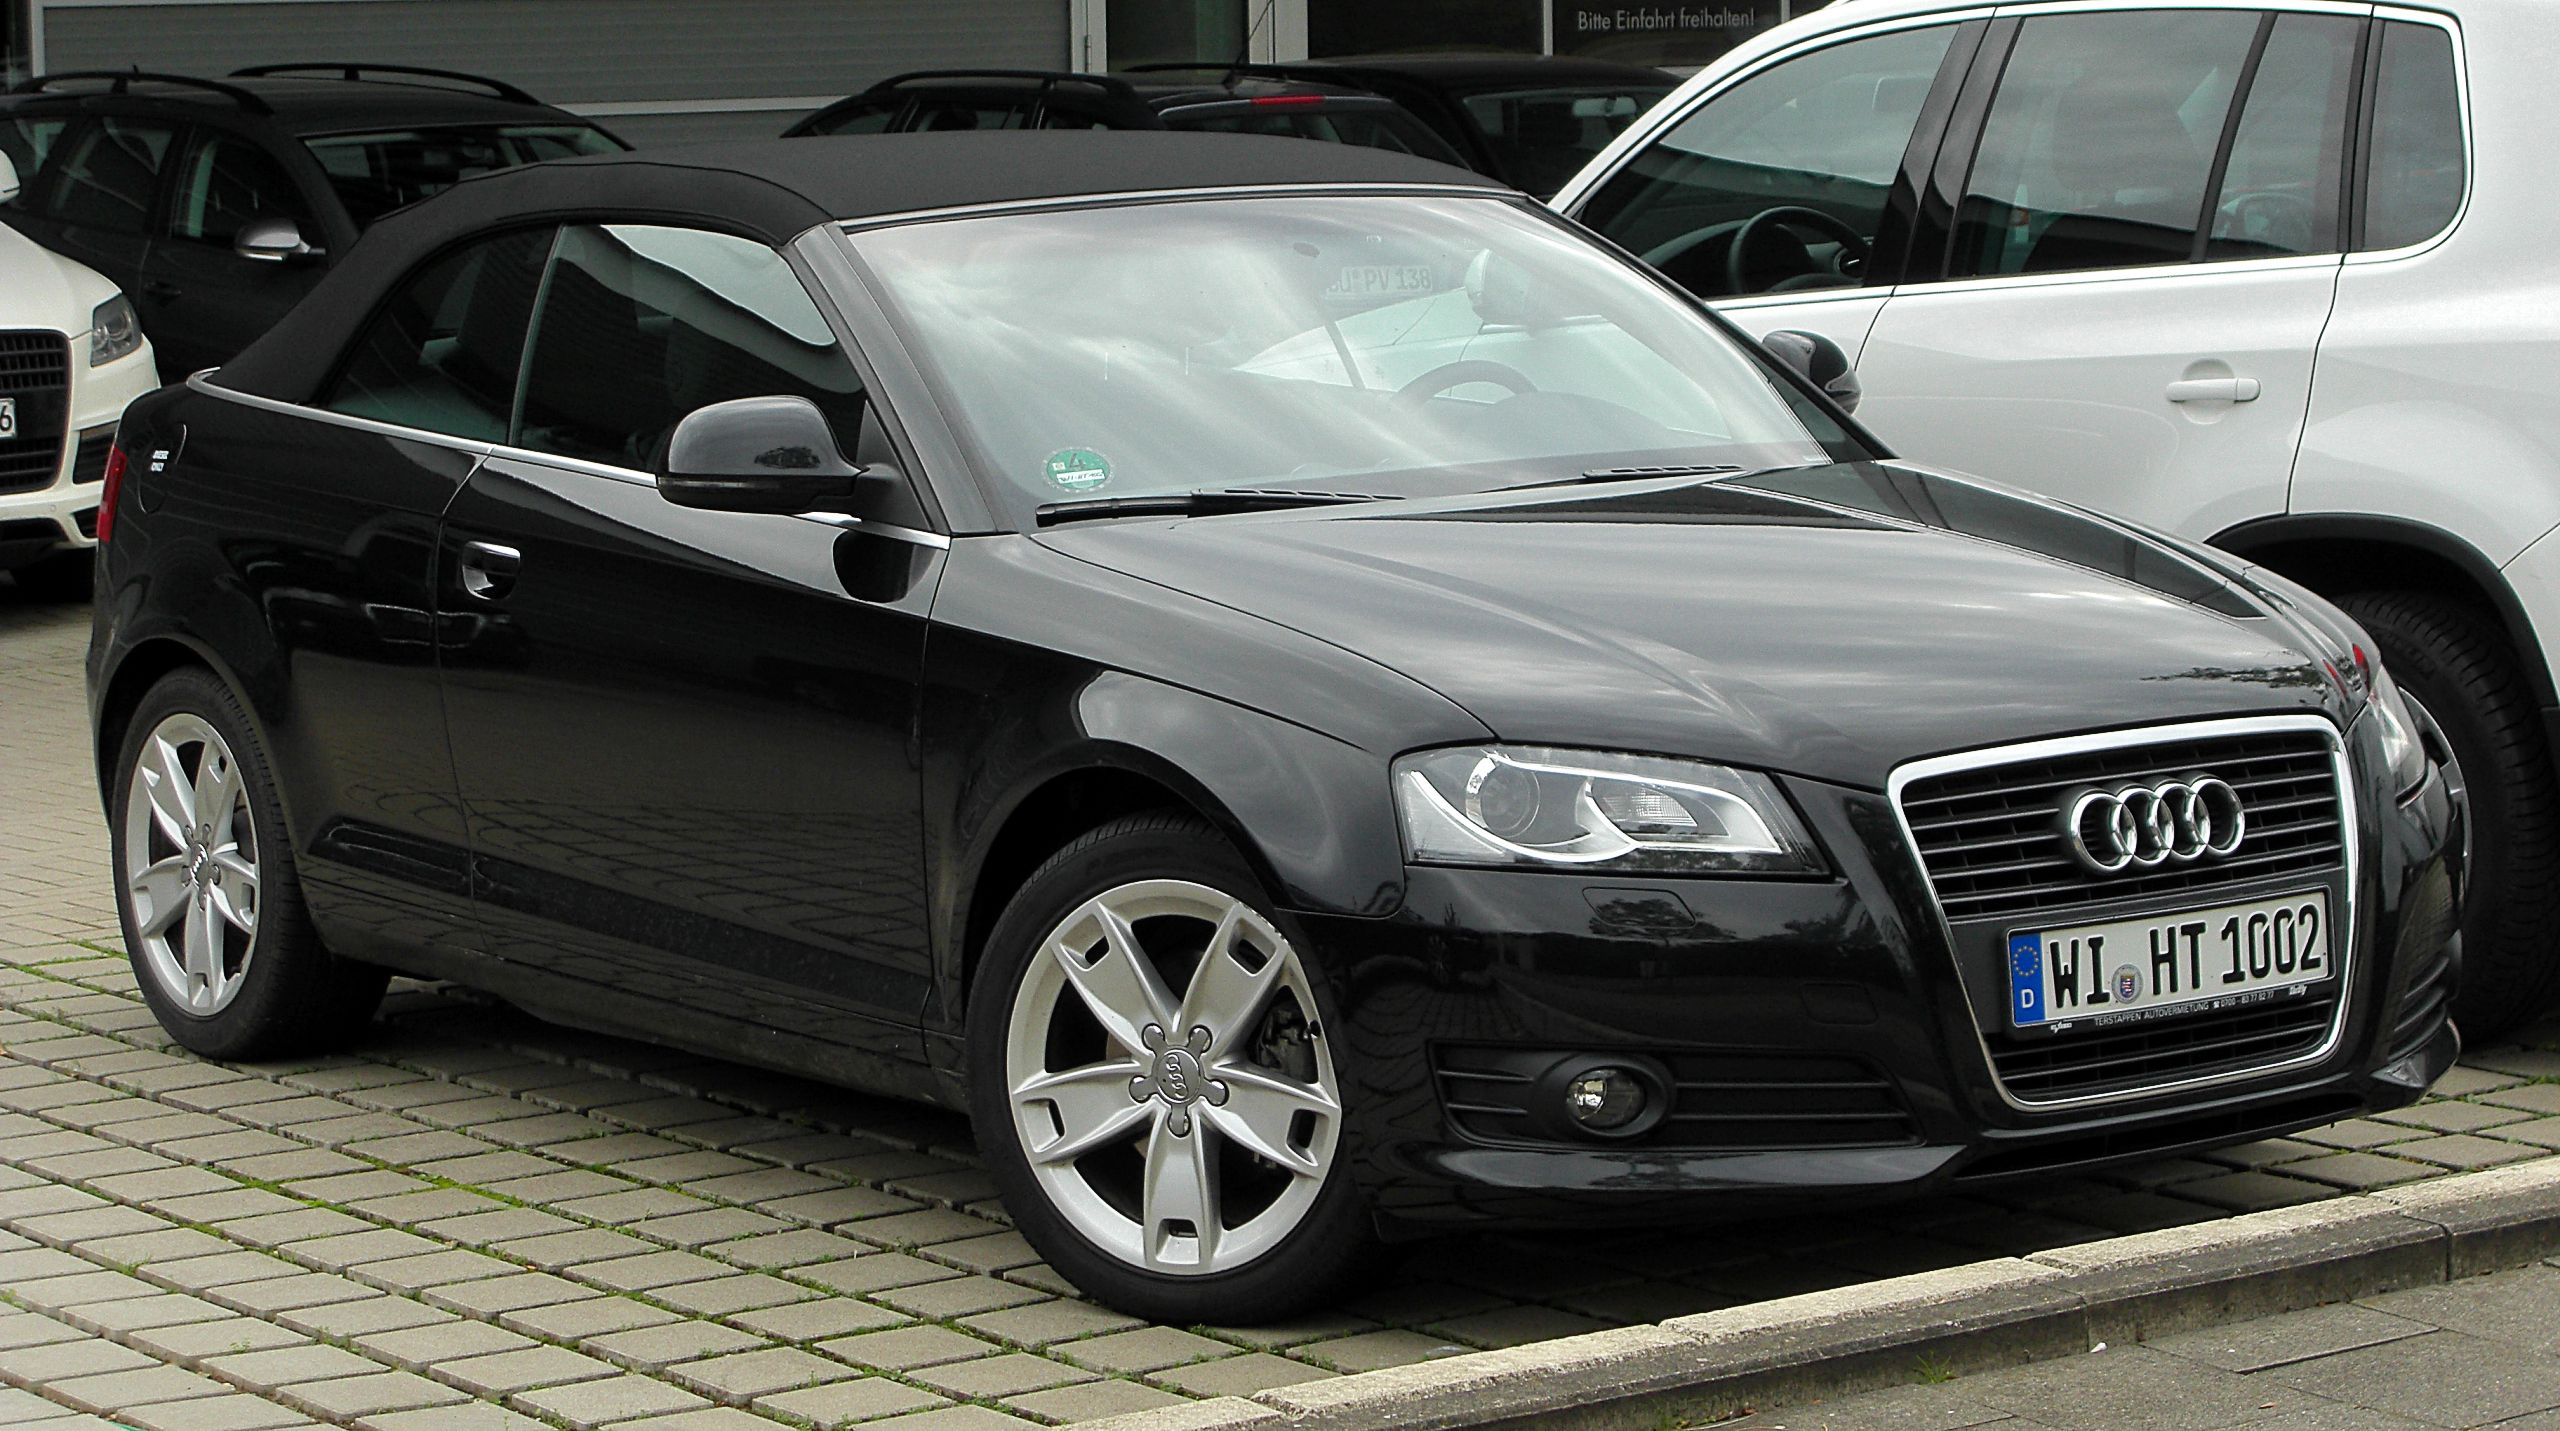 Audi 3 Convertable Audi A3 Convertible Black Picture